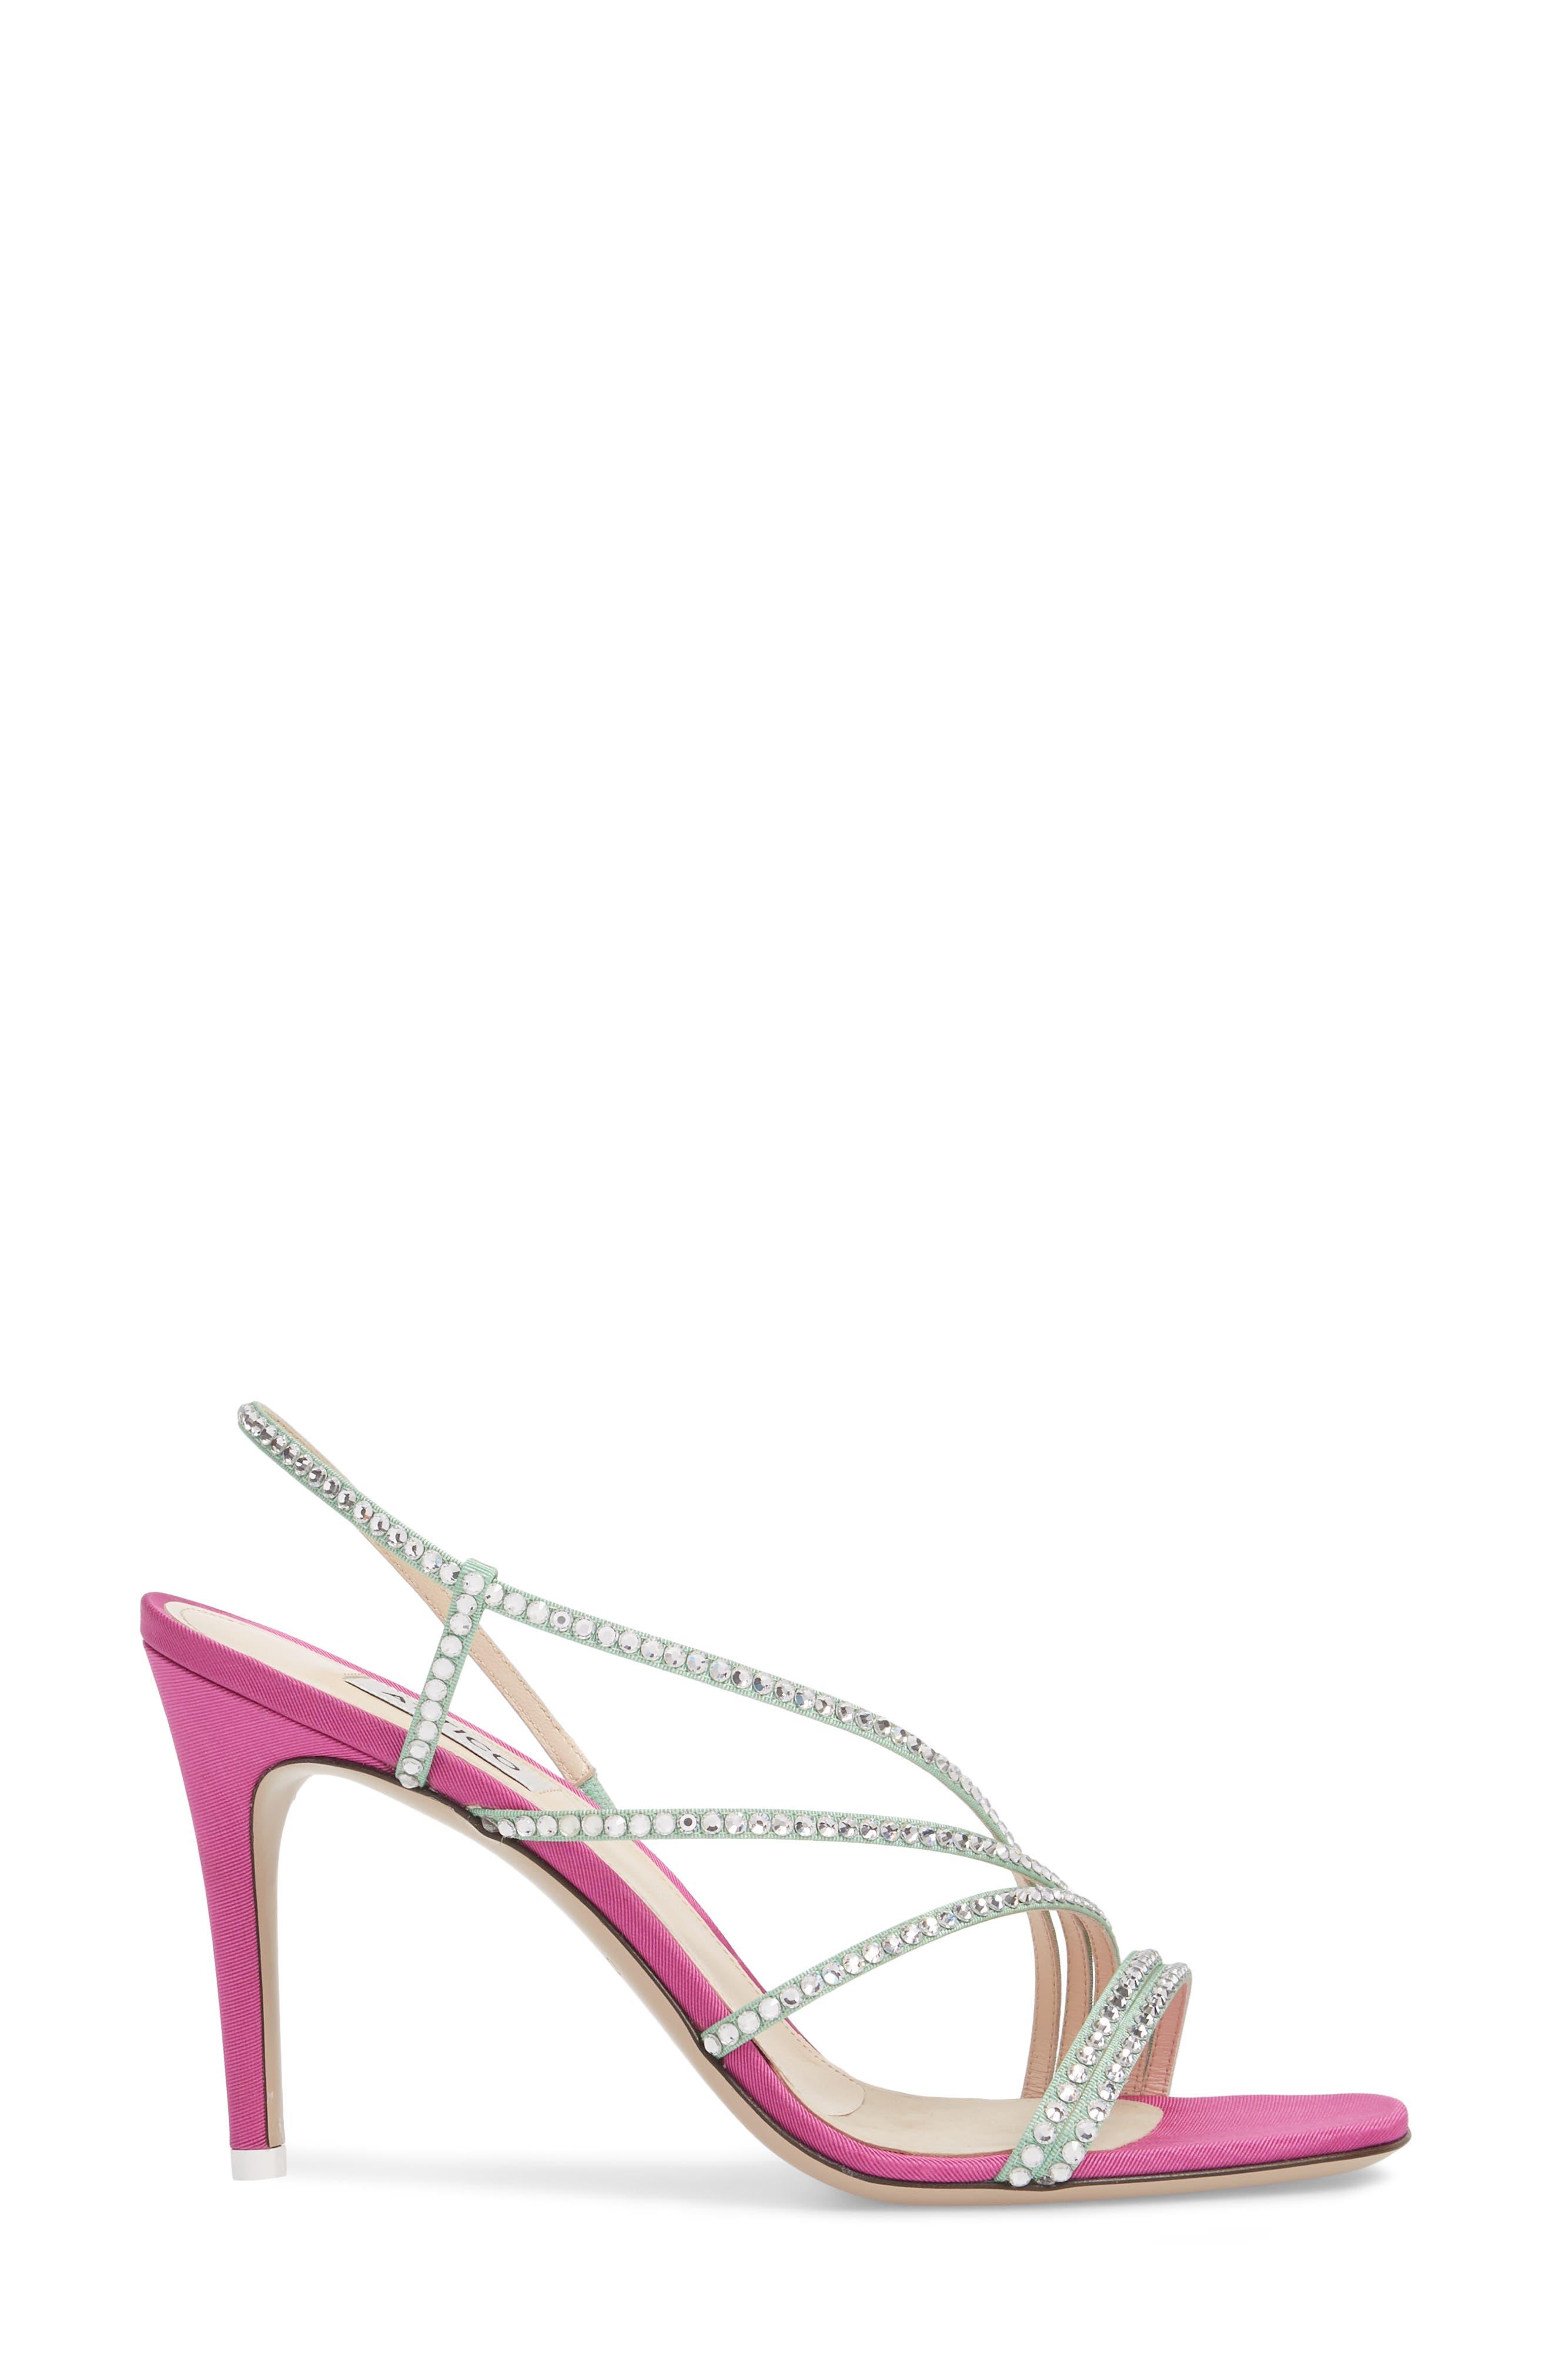 Crystal Embellished Strappy Sandal,                             Alternate thumbnail 3, color,                             Pink/ Silver